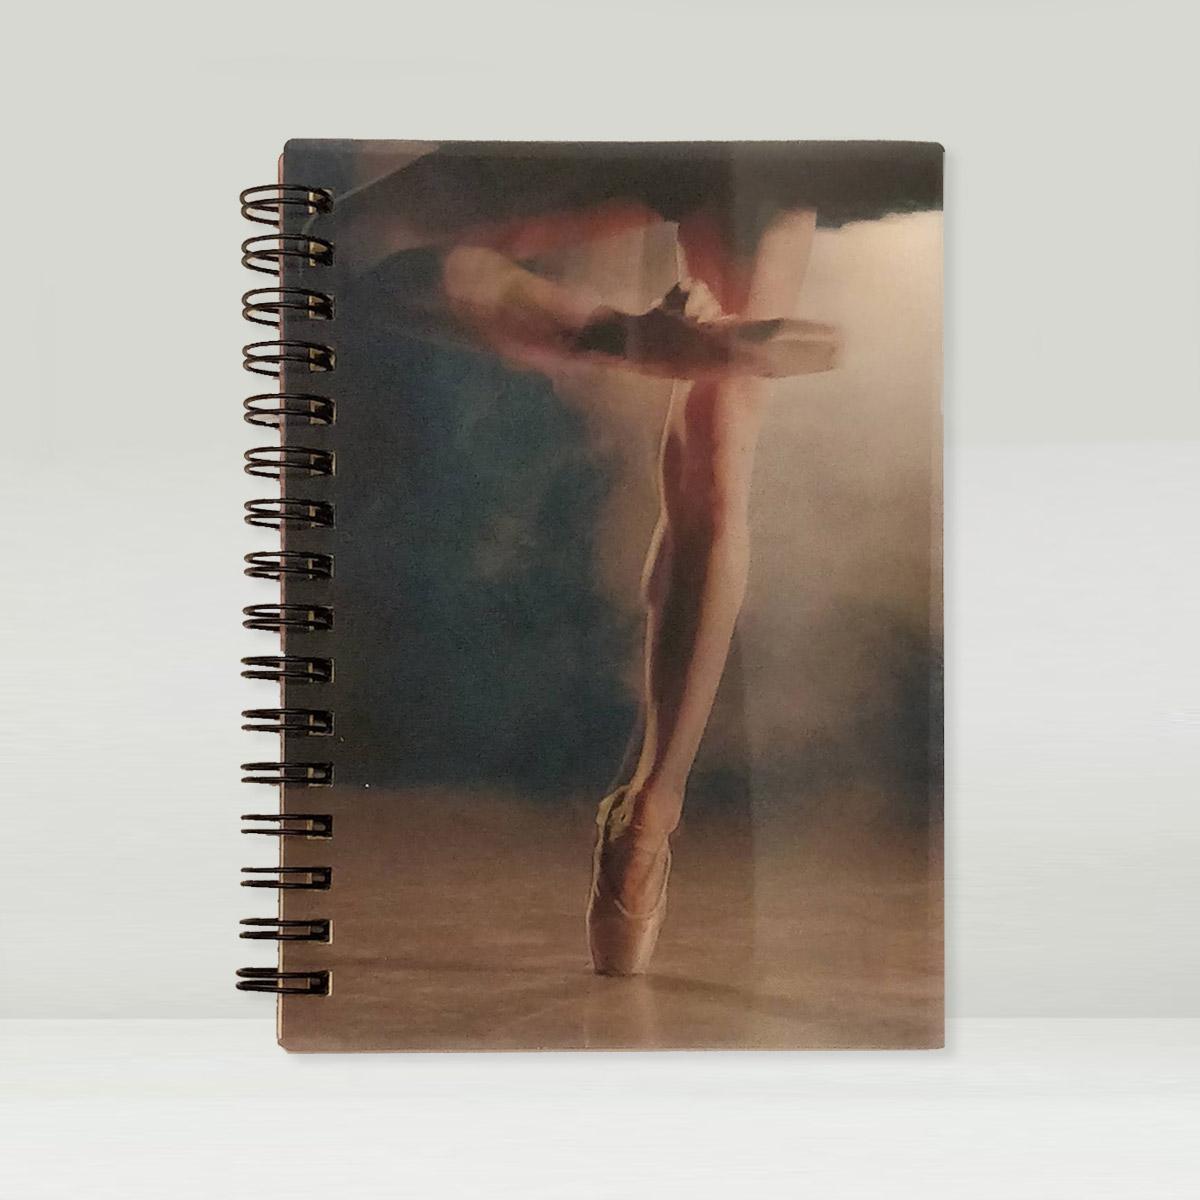 Product-Image-notebook-bg-1